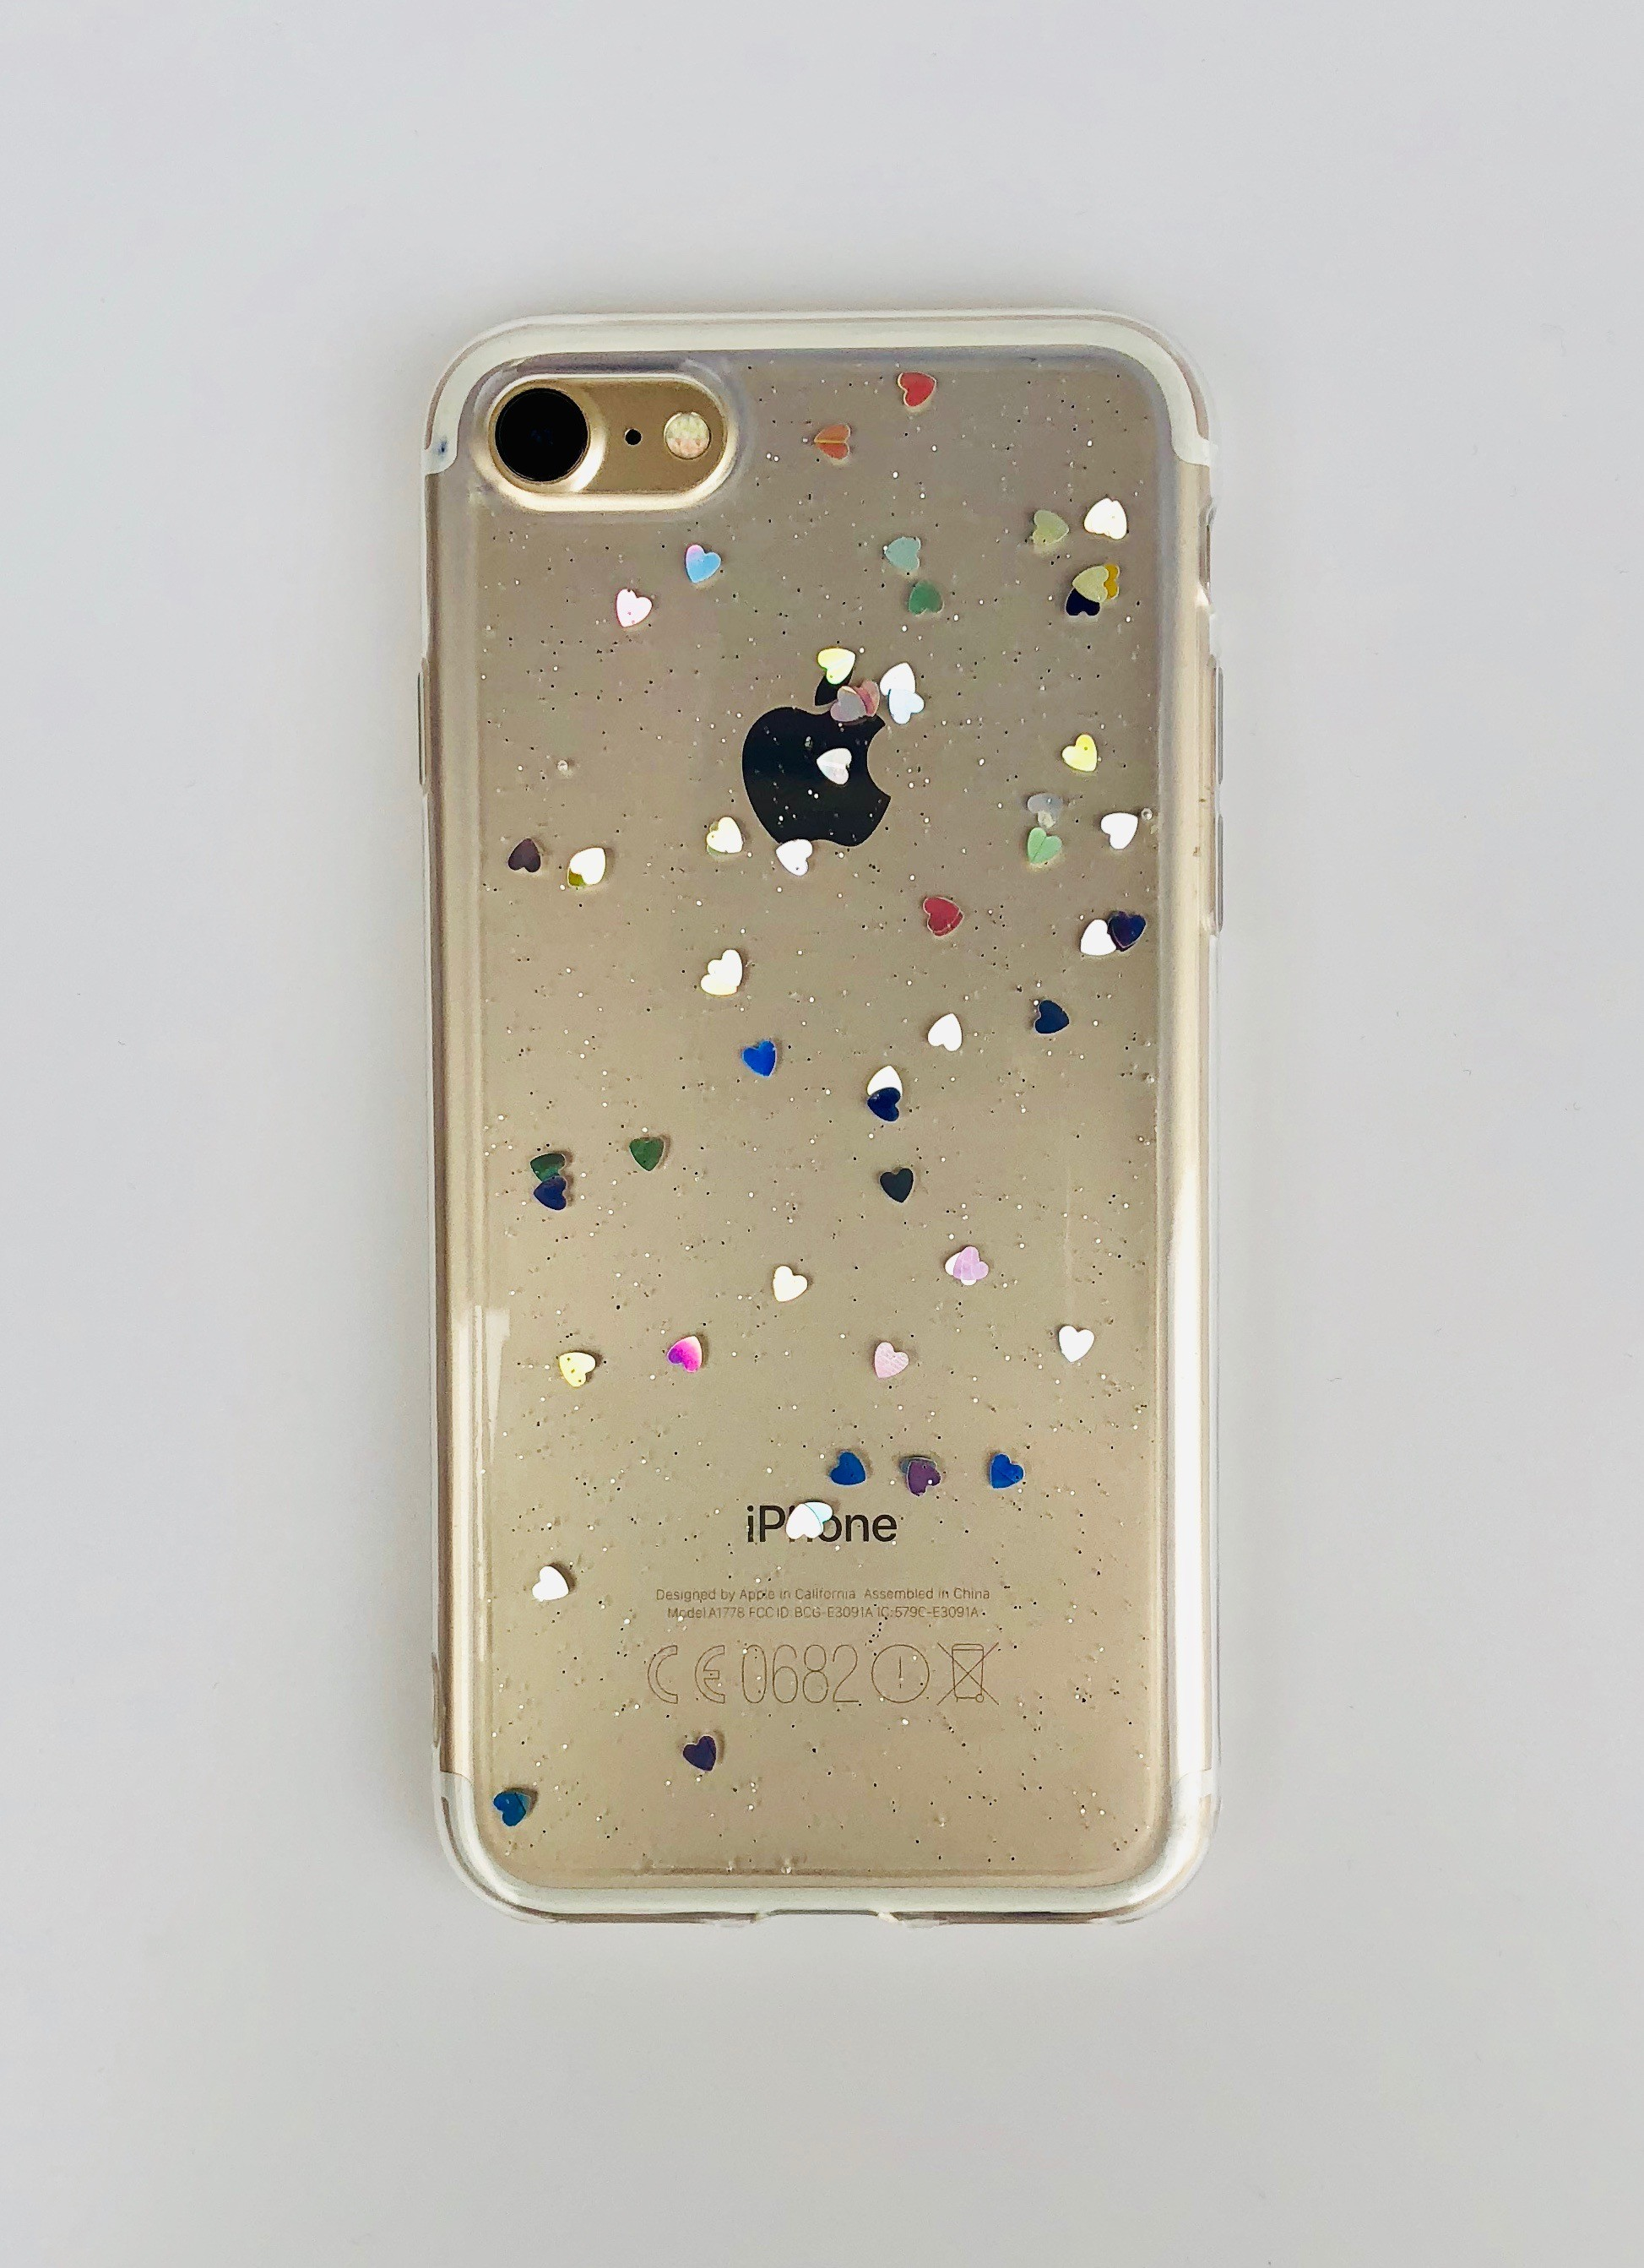 Obal na iPhone 6   6 S plus - průhledný se srdíčky b75e7df541e